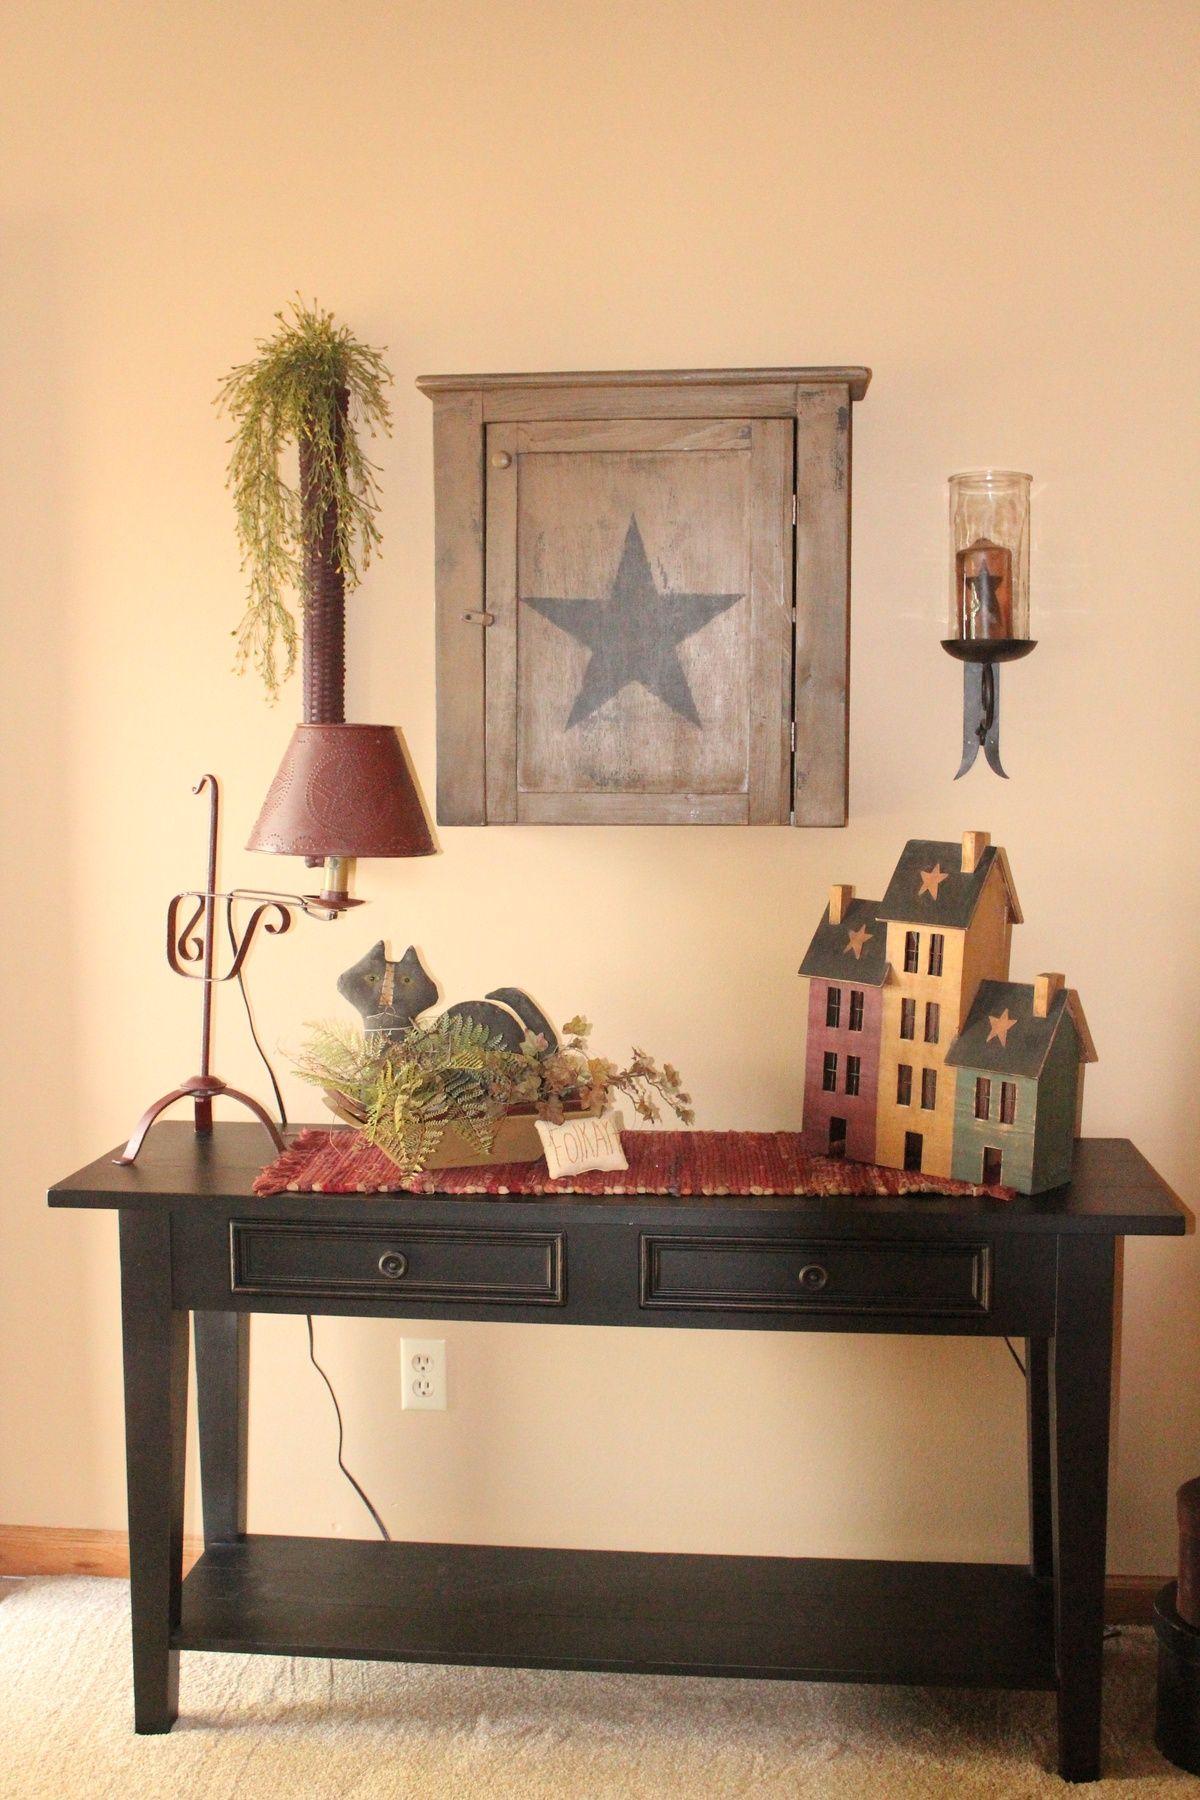 Primitive country decor living room entryway diy - Primitive country living room ideas ...